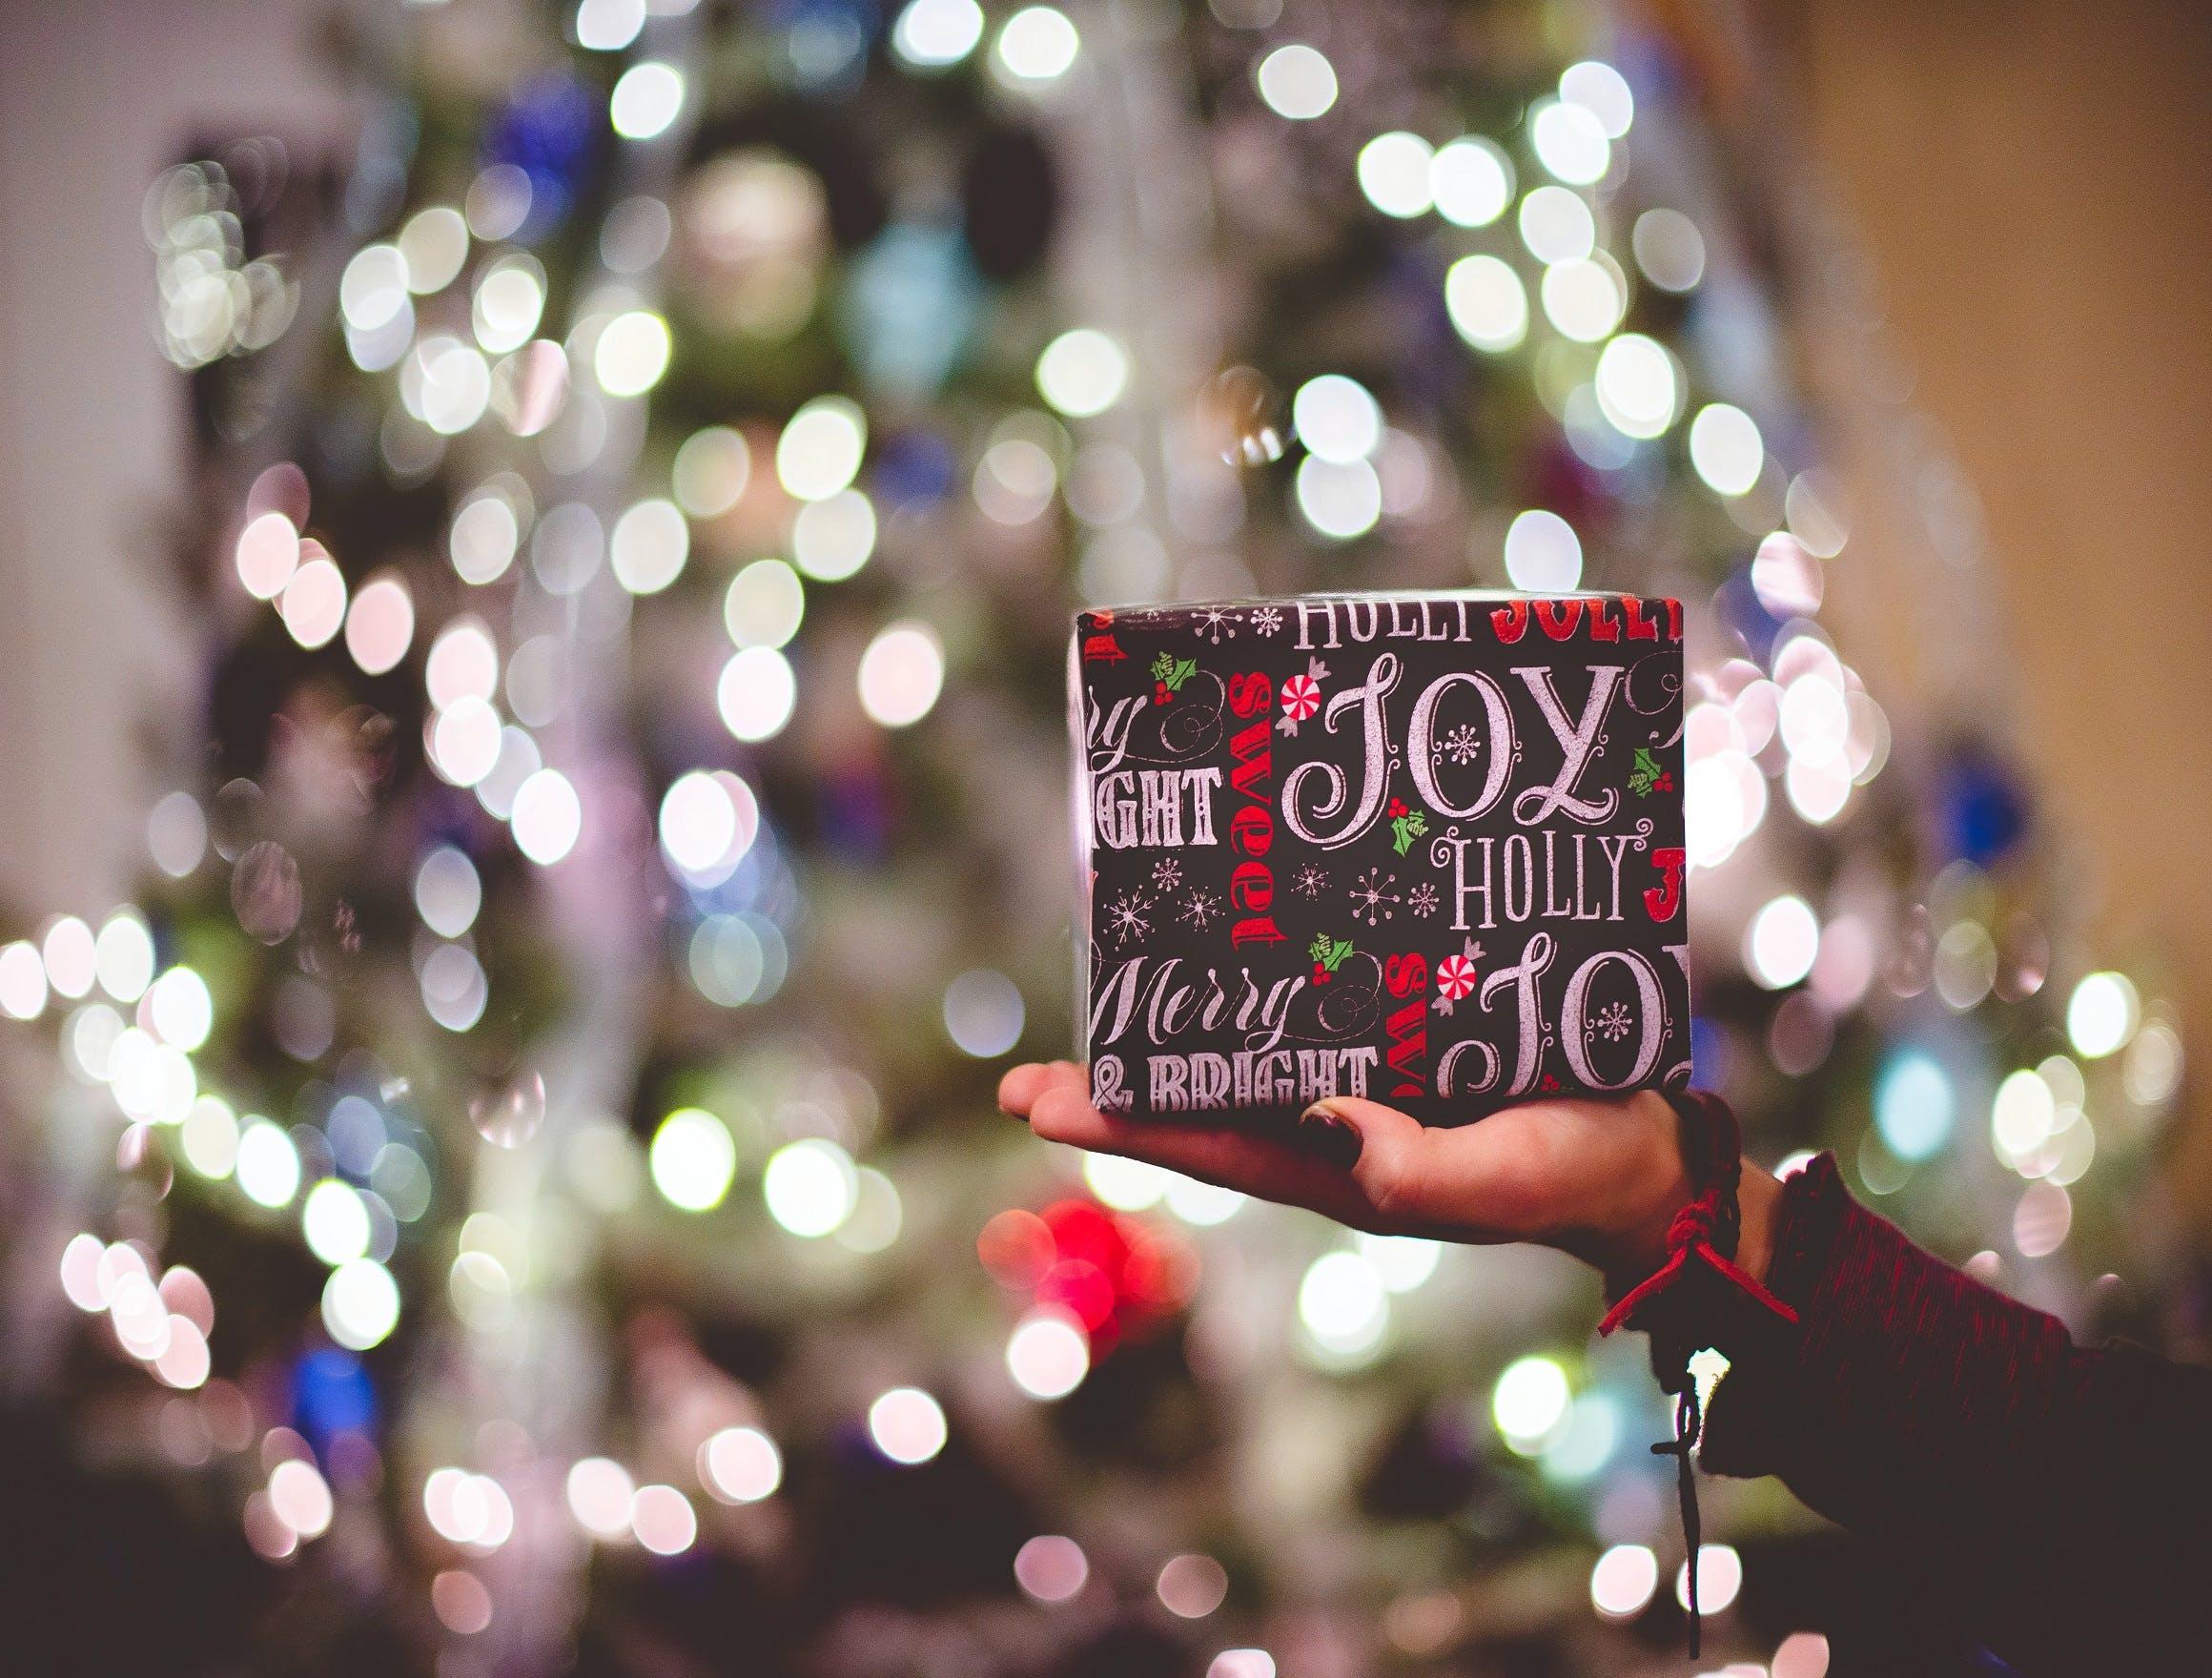 Customer choice is key this Christmas